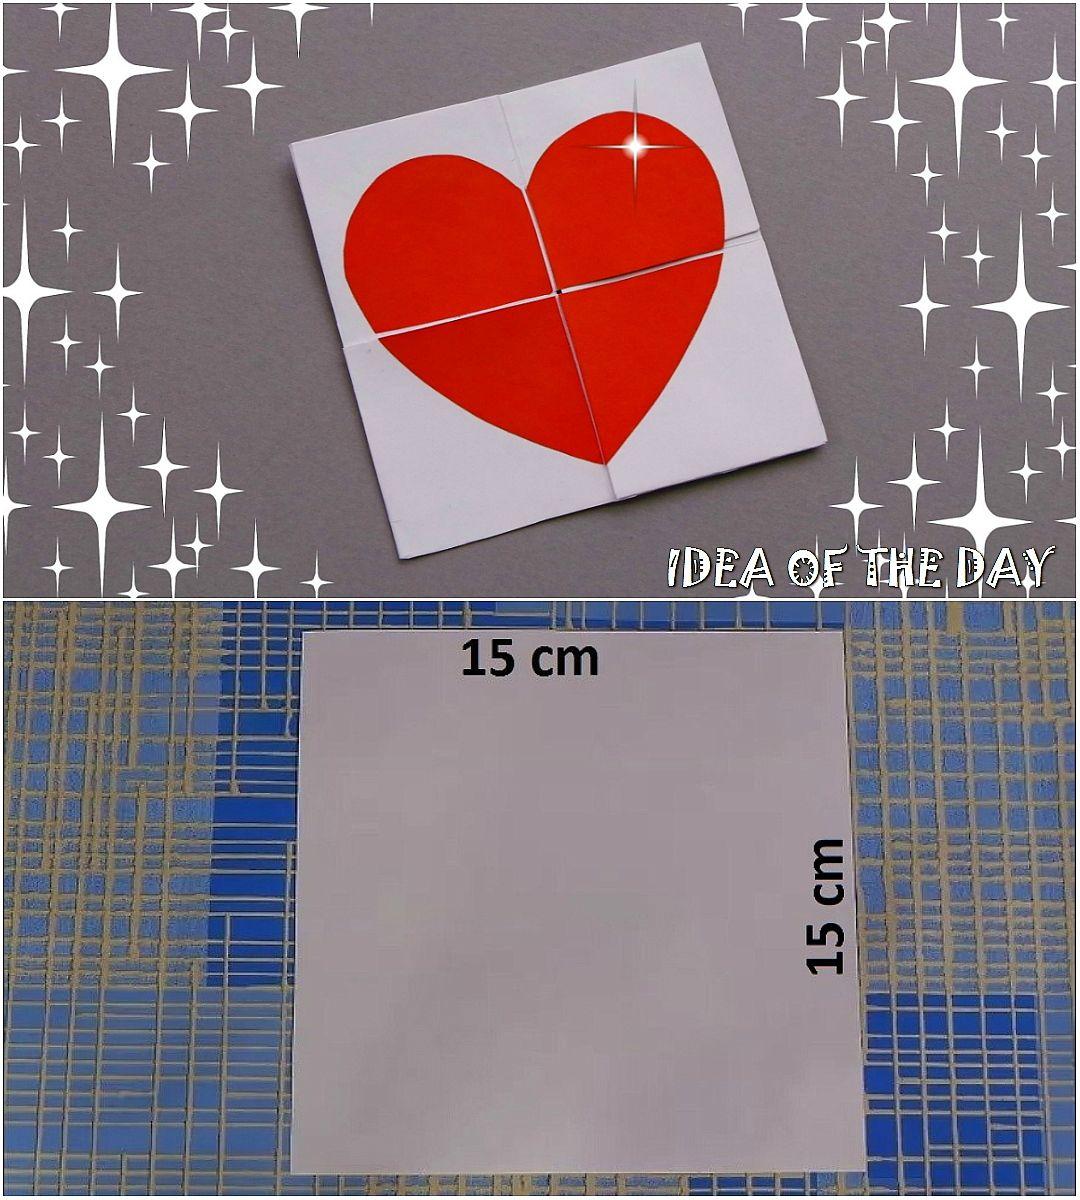 Measurements For Never Ending Card Endless Card This Measurements For Never Ending Card Endless Card How To Make Ne Cards Never Ending Card Cards Handmade